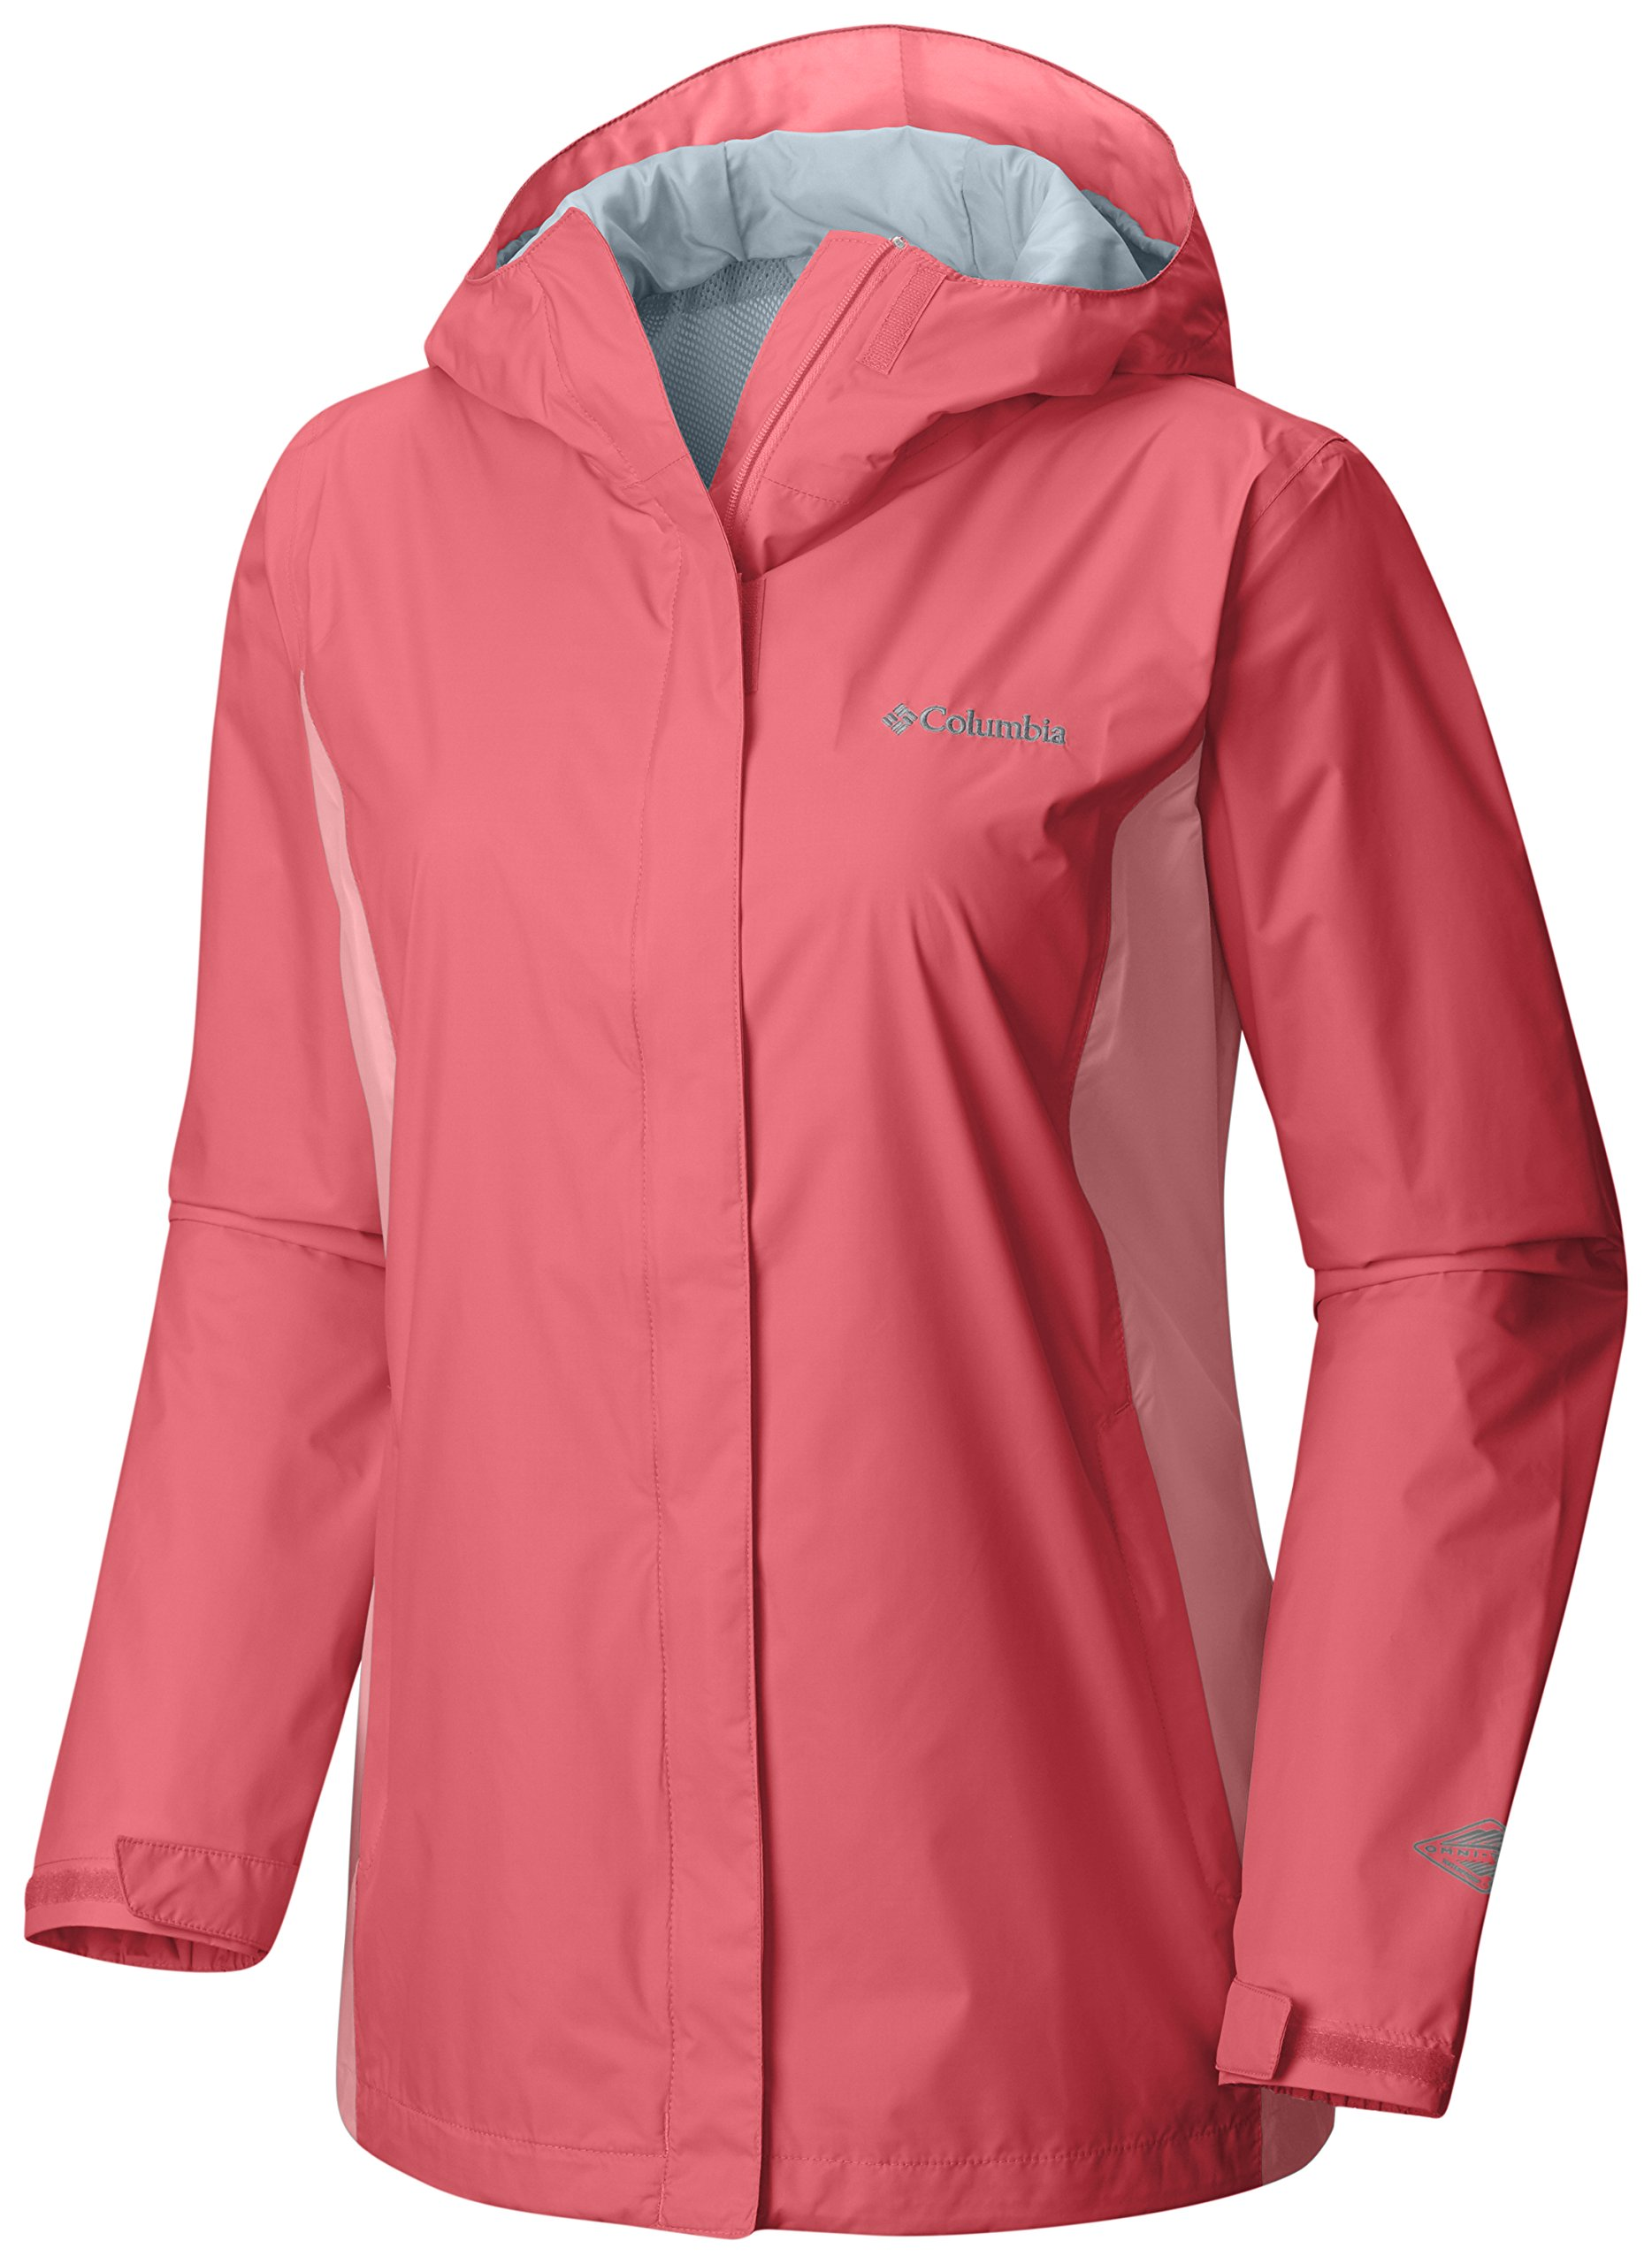 Columbia Women's Plus Size Arcadia Ii Jacket, Blush Pink, Sorbet, 1X